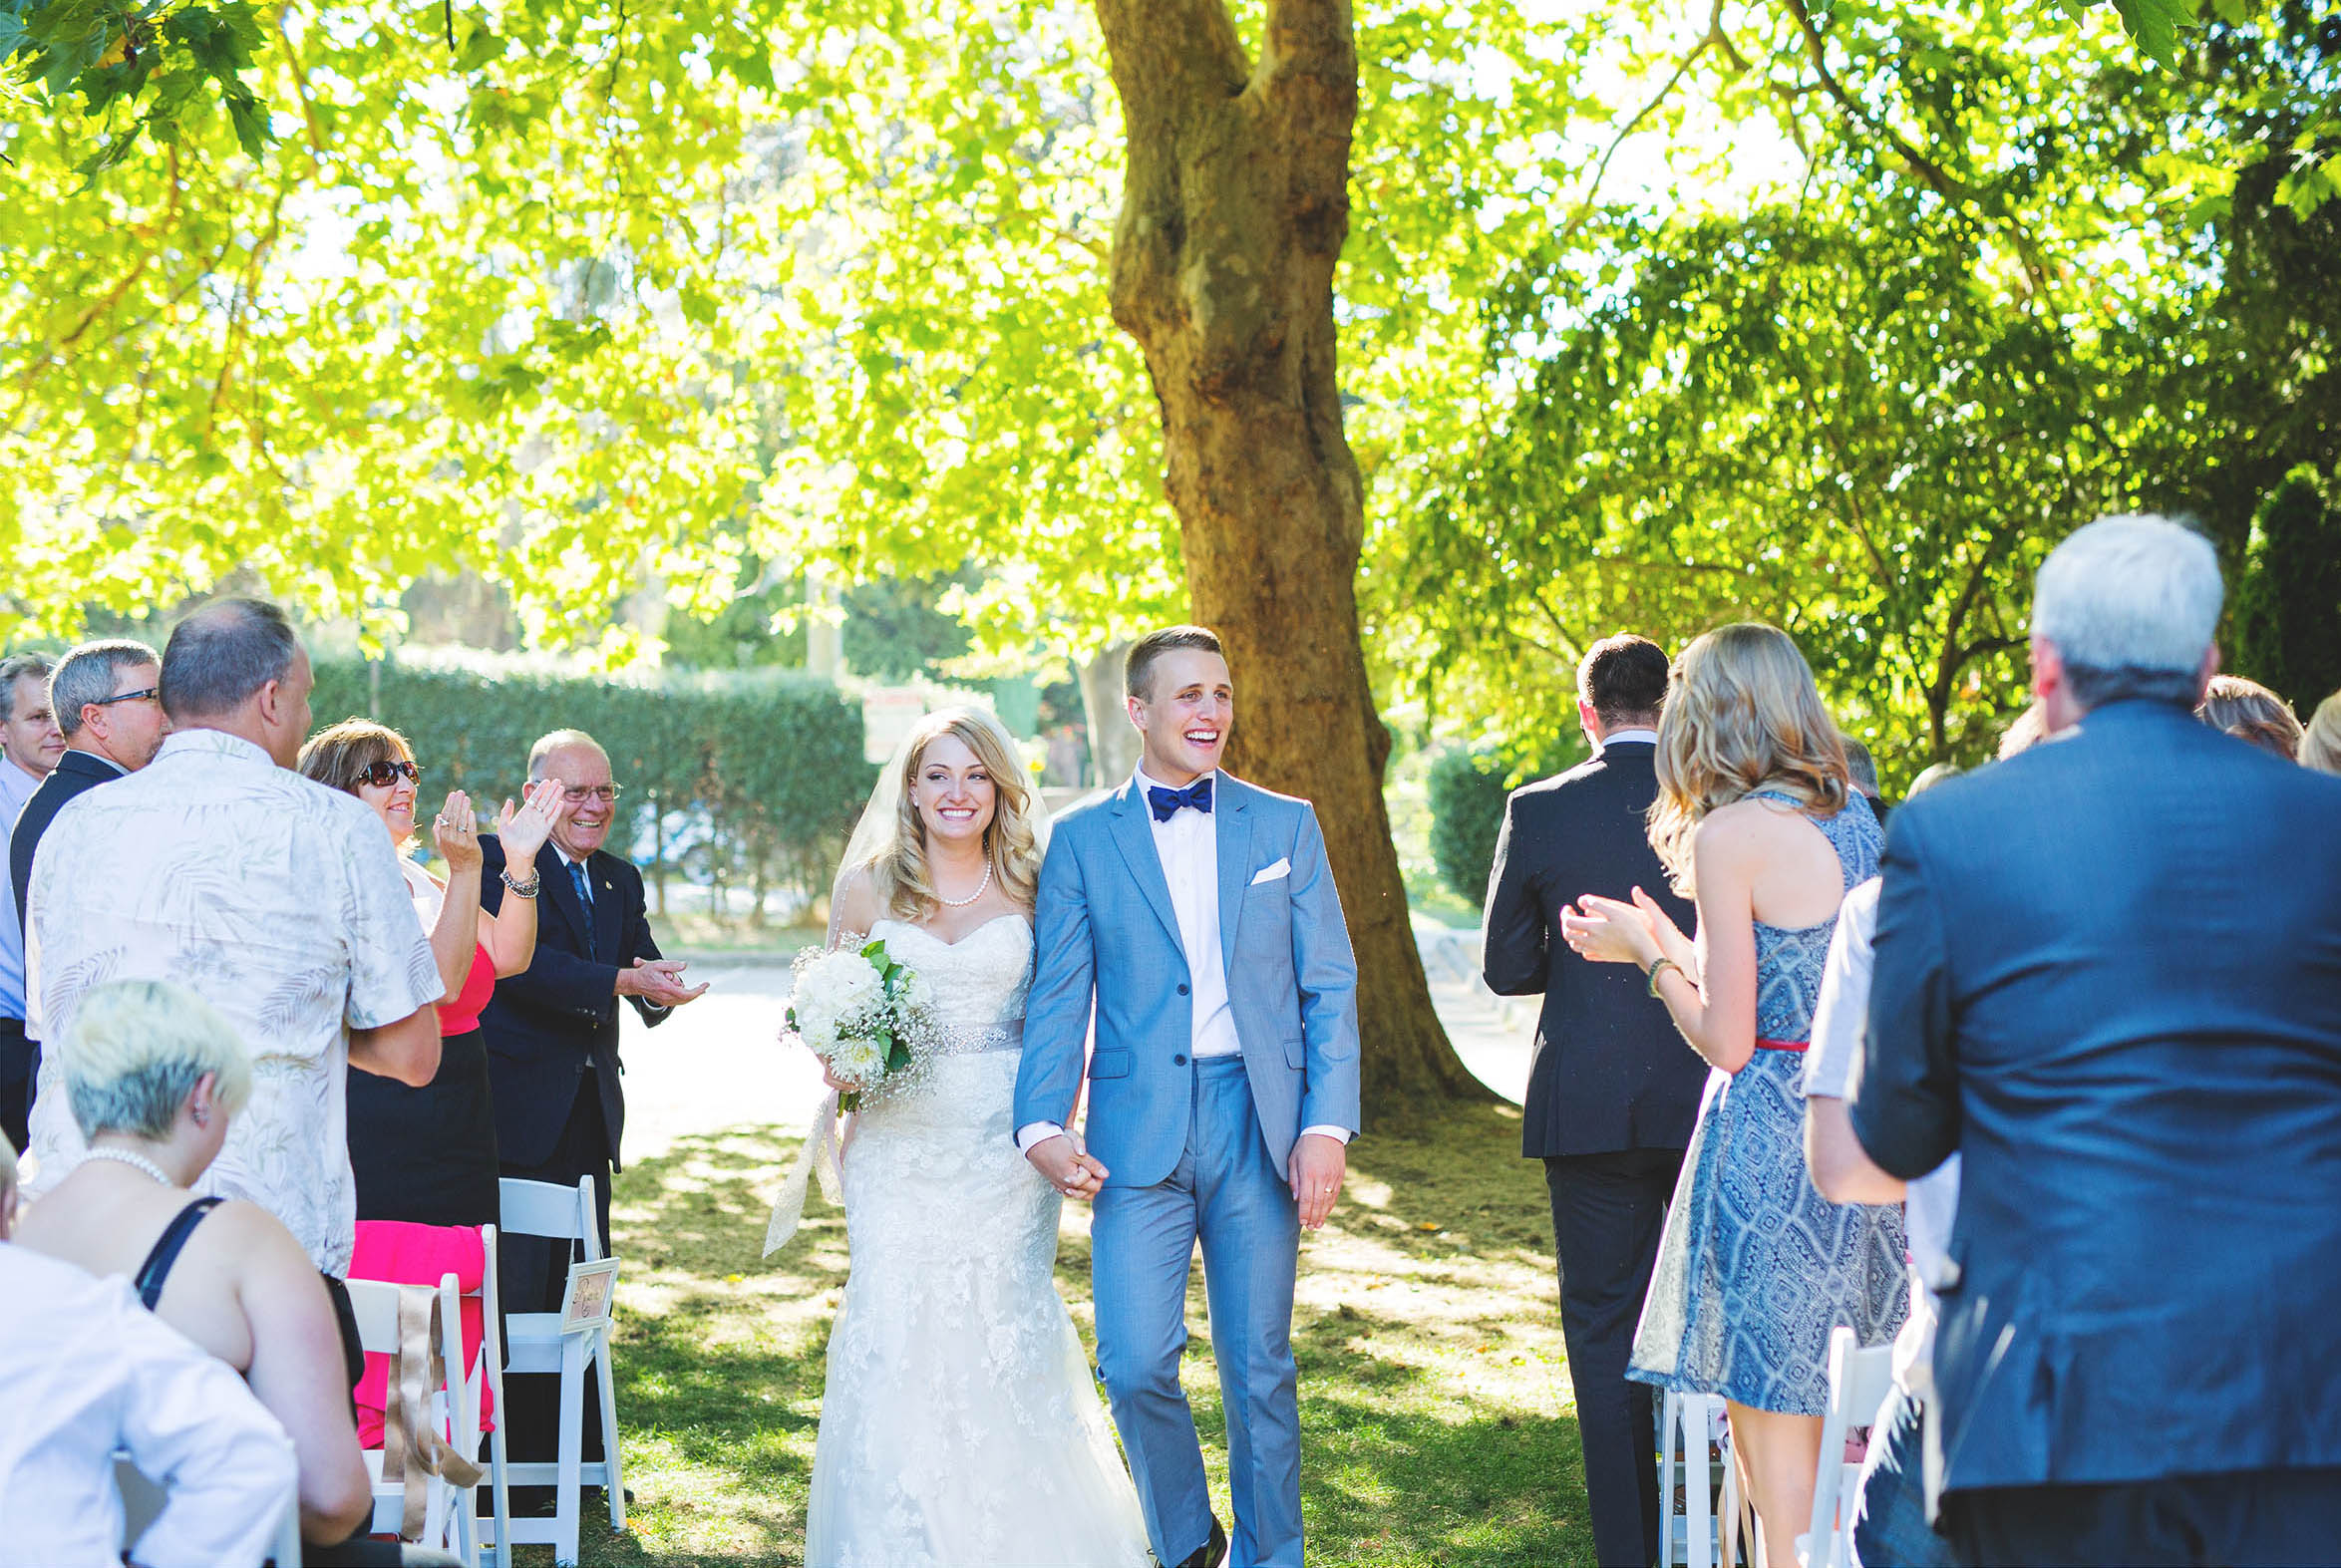 IMG_4143  VANCOUVER WEDDING PHOTOGRAPHER JENNIFER PICARD PHOTOGRAPHY.jpg